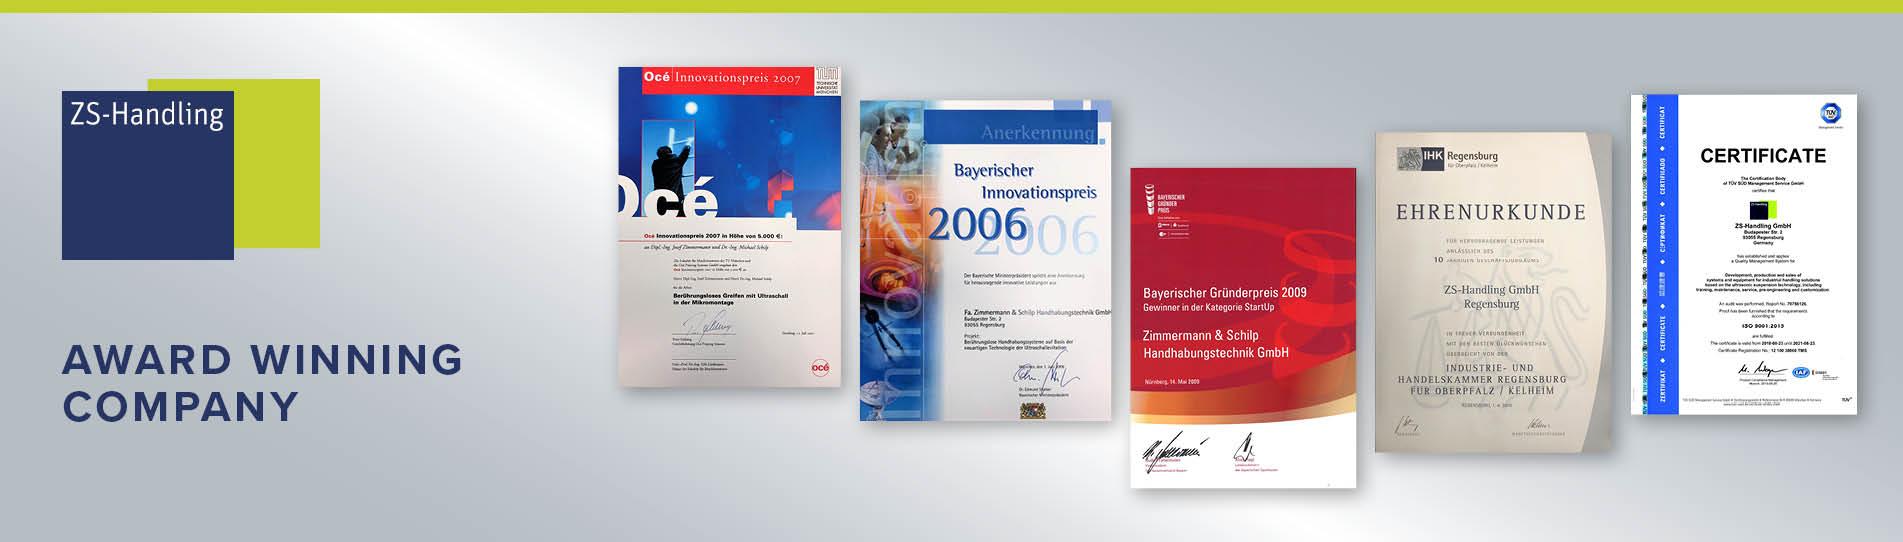 awardwinning-company